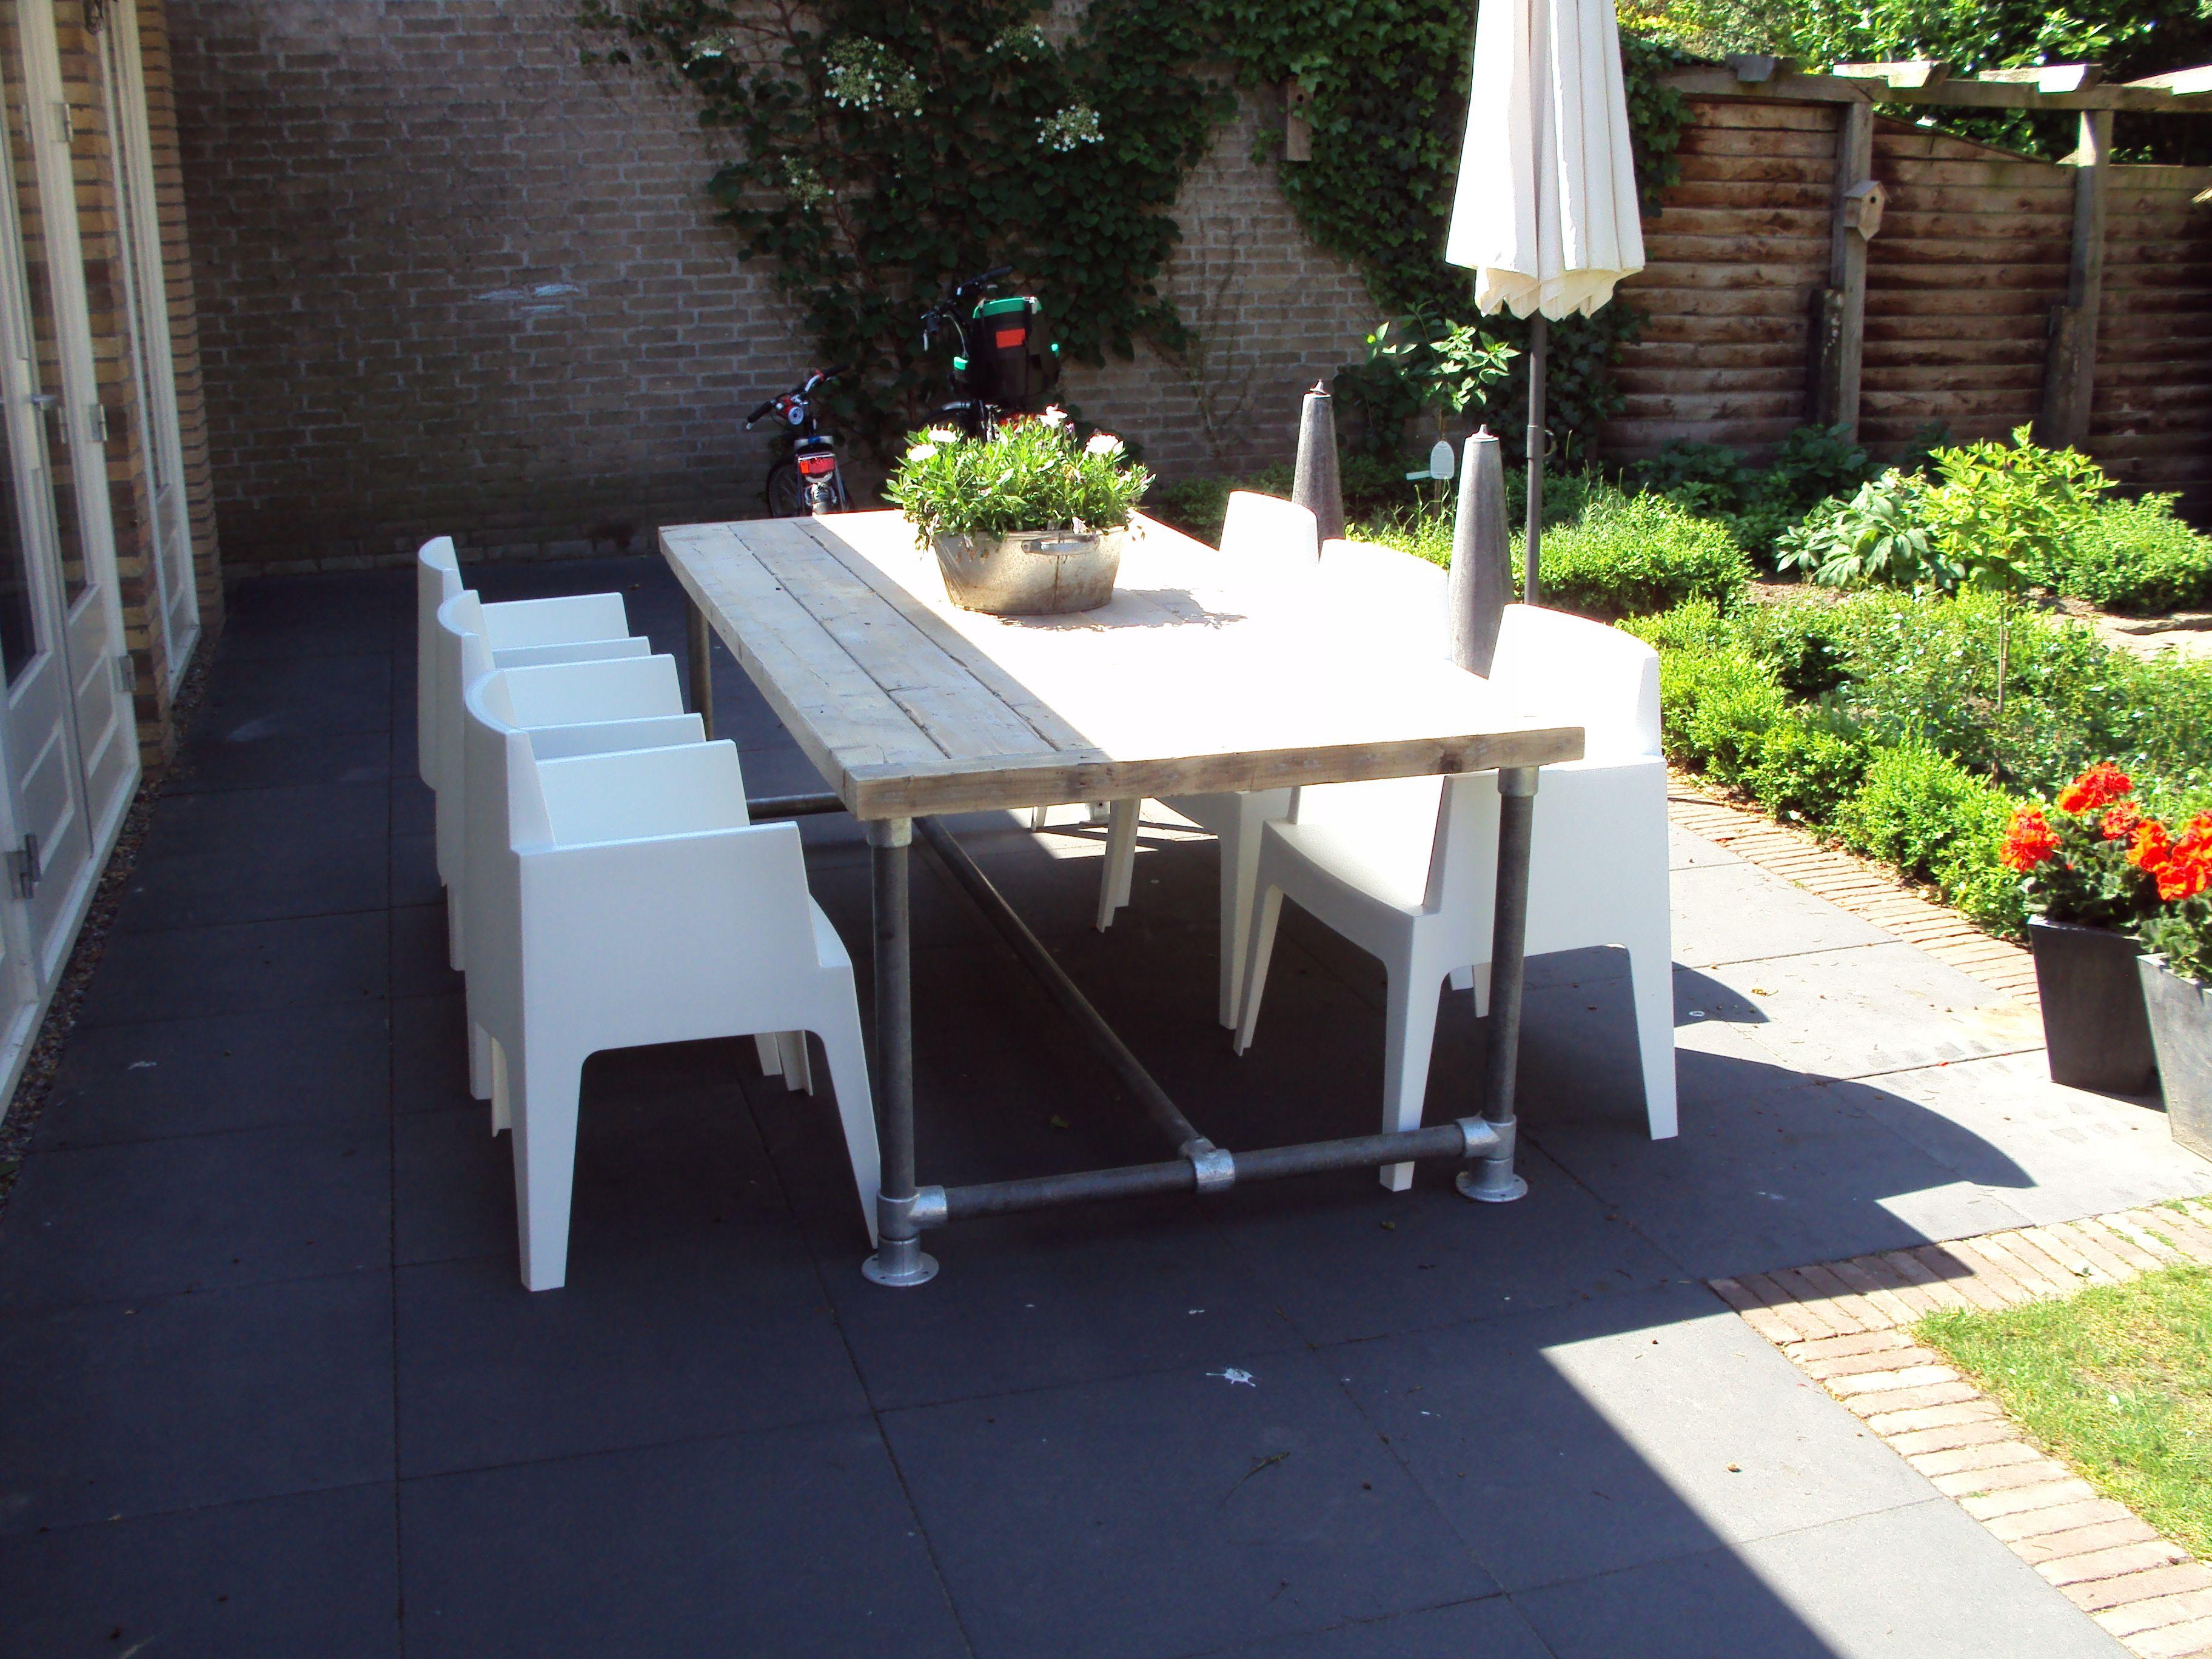 Steigerhout Steigerbuis Tafel : Steigerbuis tafel met steigerhout outdoor pinterest tuin and